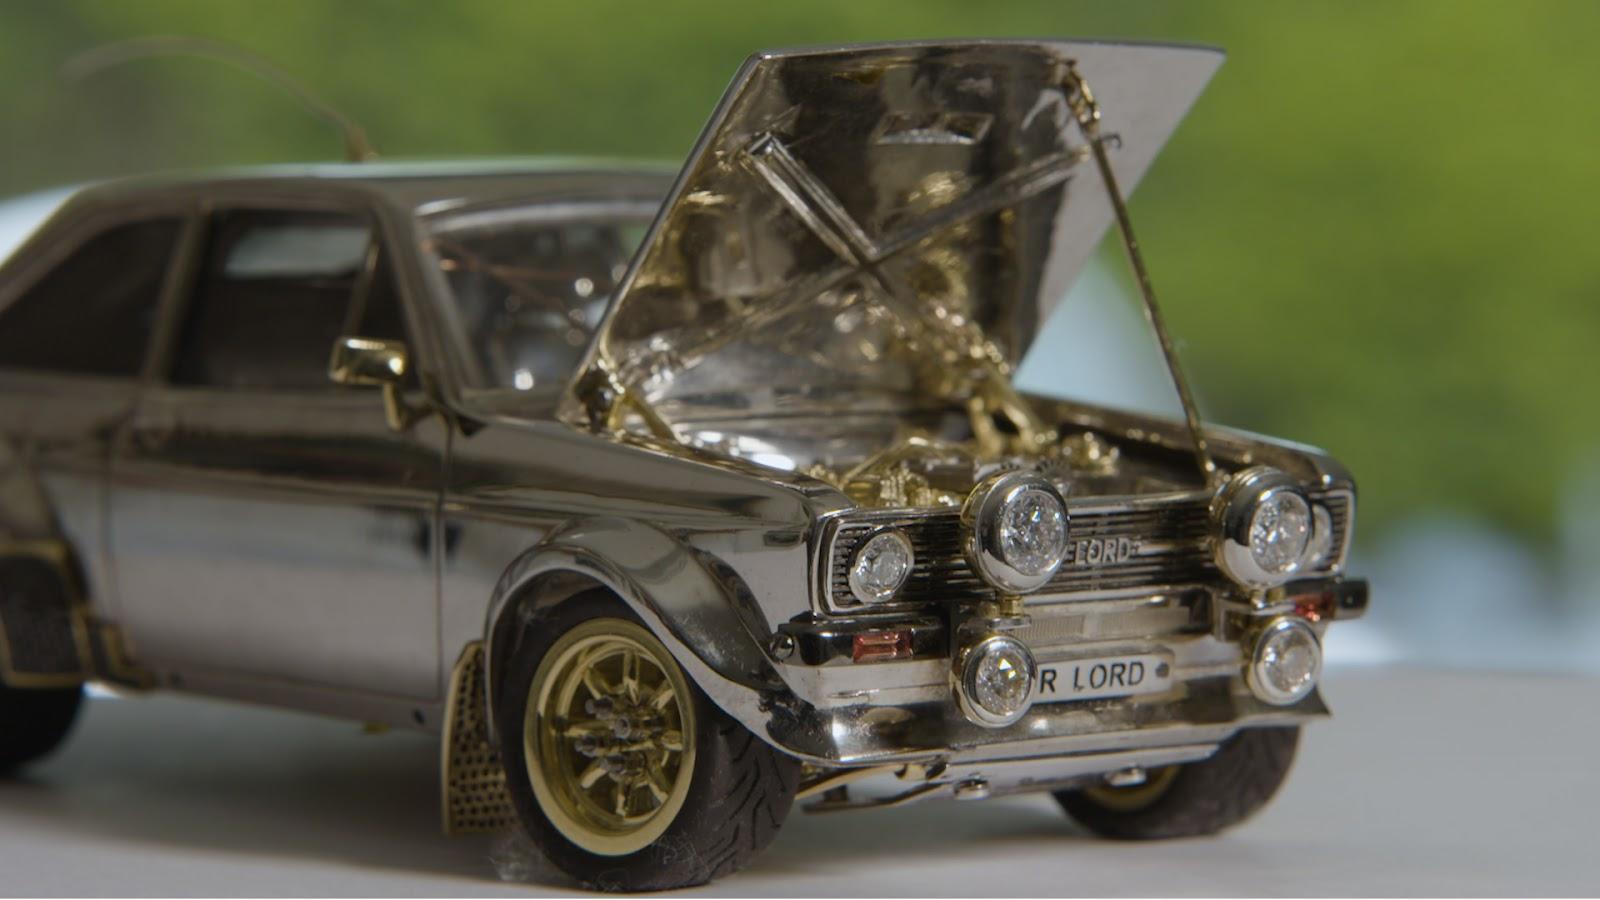 JewelledEscort 03 Ένα Ford Escort Mk2 κατασκευασμένο από χρυσό, διαμάντια και ασήμι! Ari Vatanen, Classic, Ford, Ford Escort, Ford Eskort mk2, video, videos, δημοπρασία